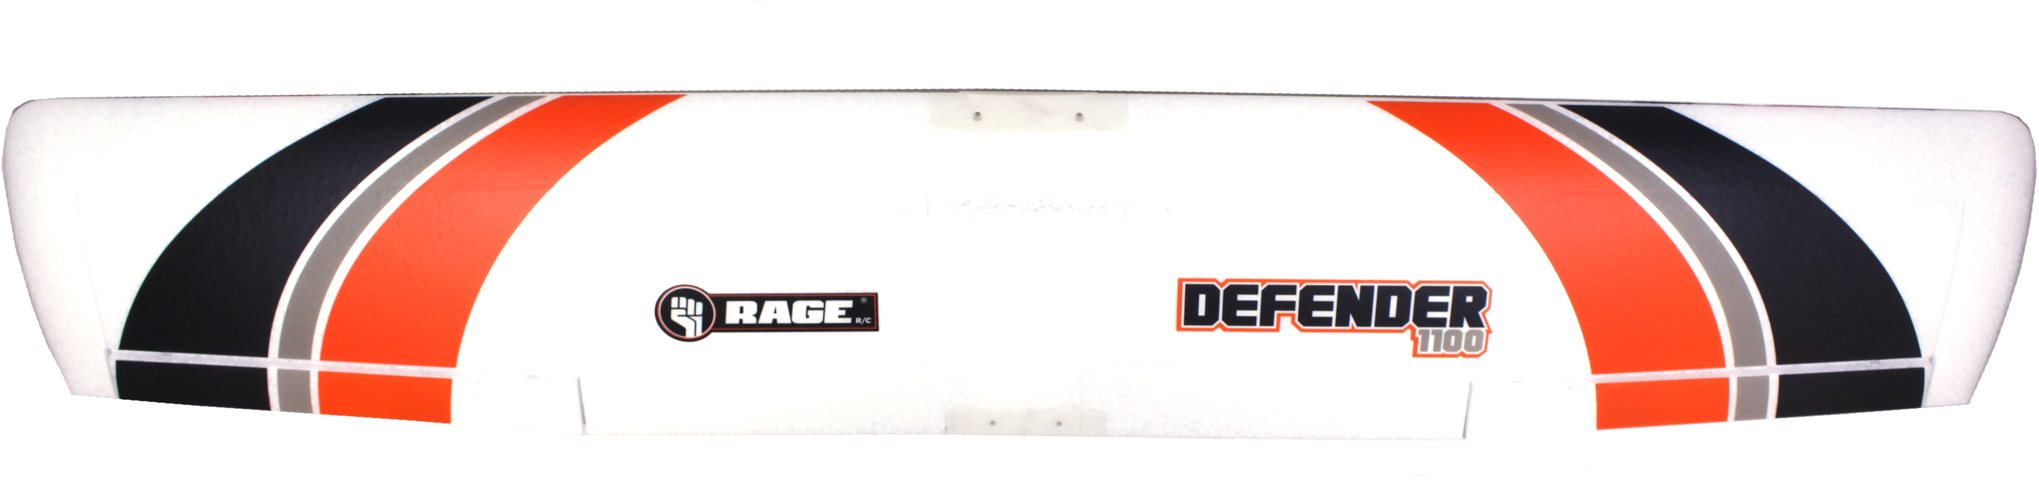 Rage RC Main Wing; Defender 1100